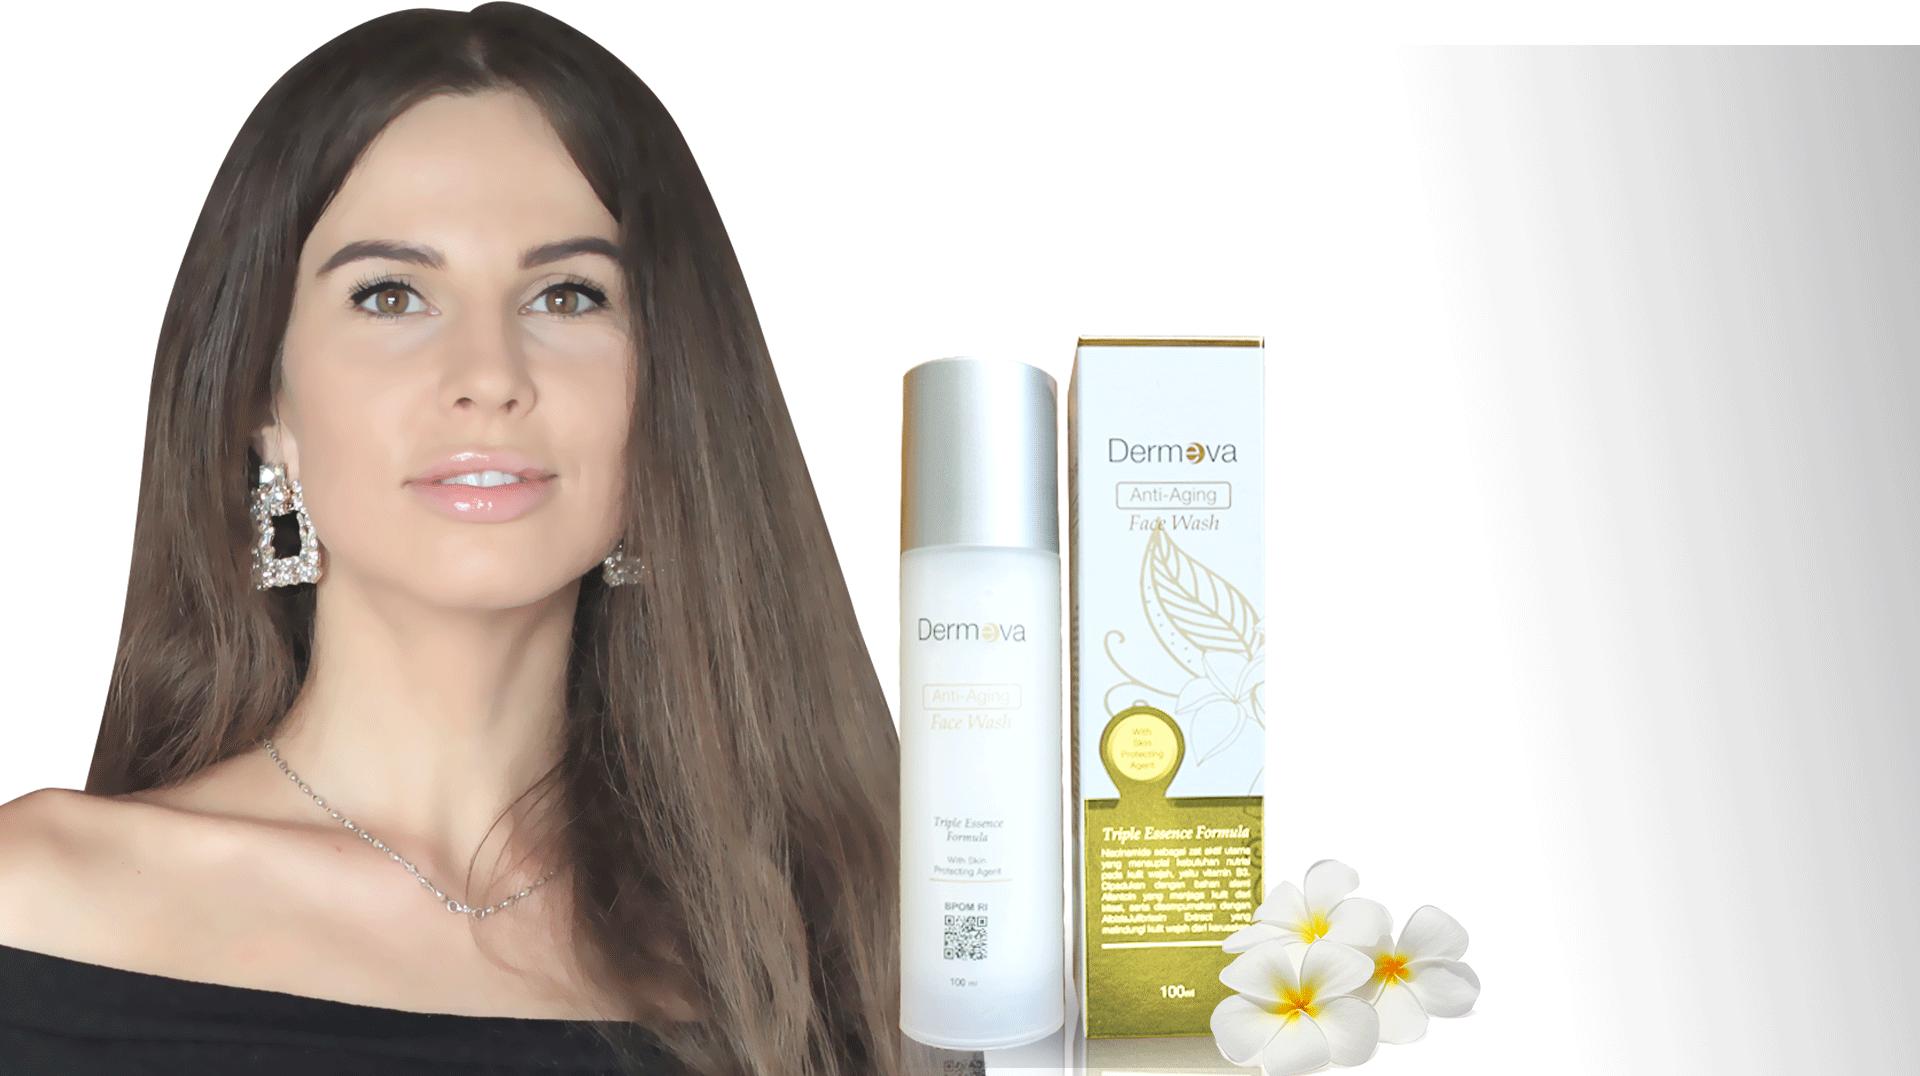 Dermeva Anti-Aging Face Wash banner